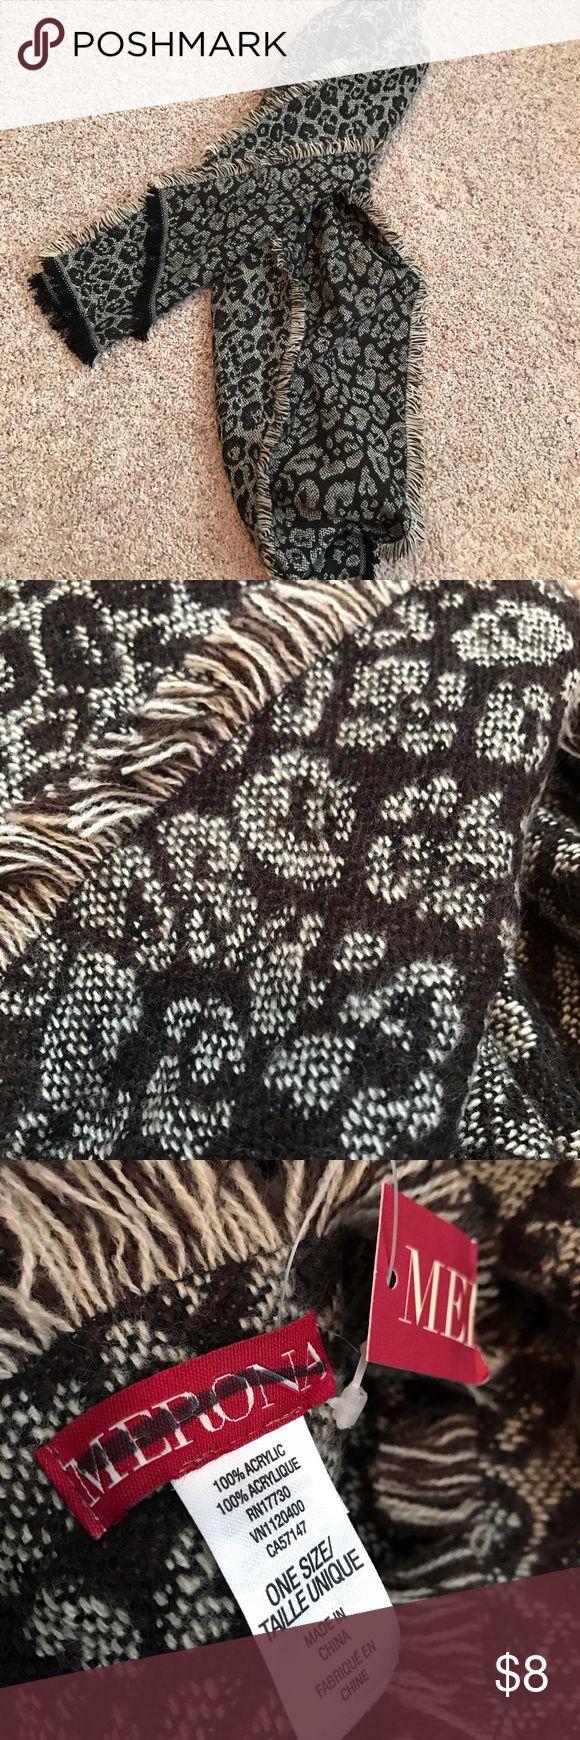 ✨🆕✨NWT Merona Leopard Print Scarf ✨🆕✨NWT Merona Leopard Print Scarf. Coming from a smoke free home. 🚫 trades. Merona Accessories Scarves & Wraps